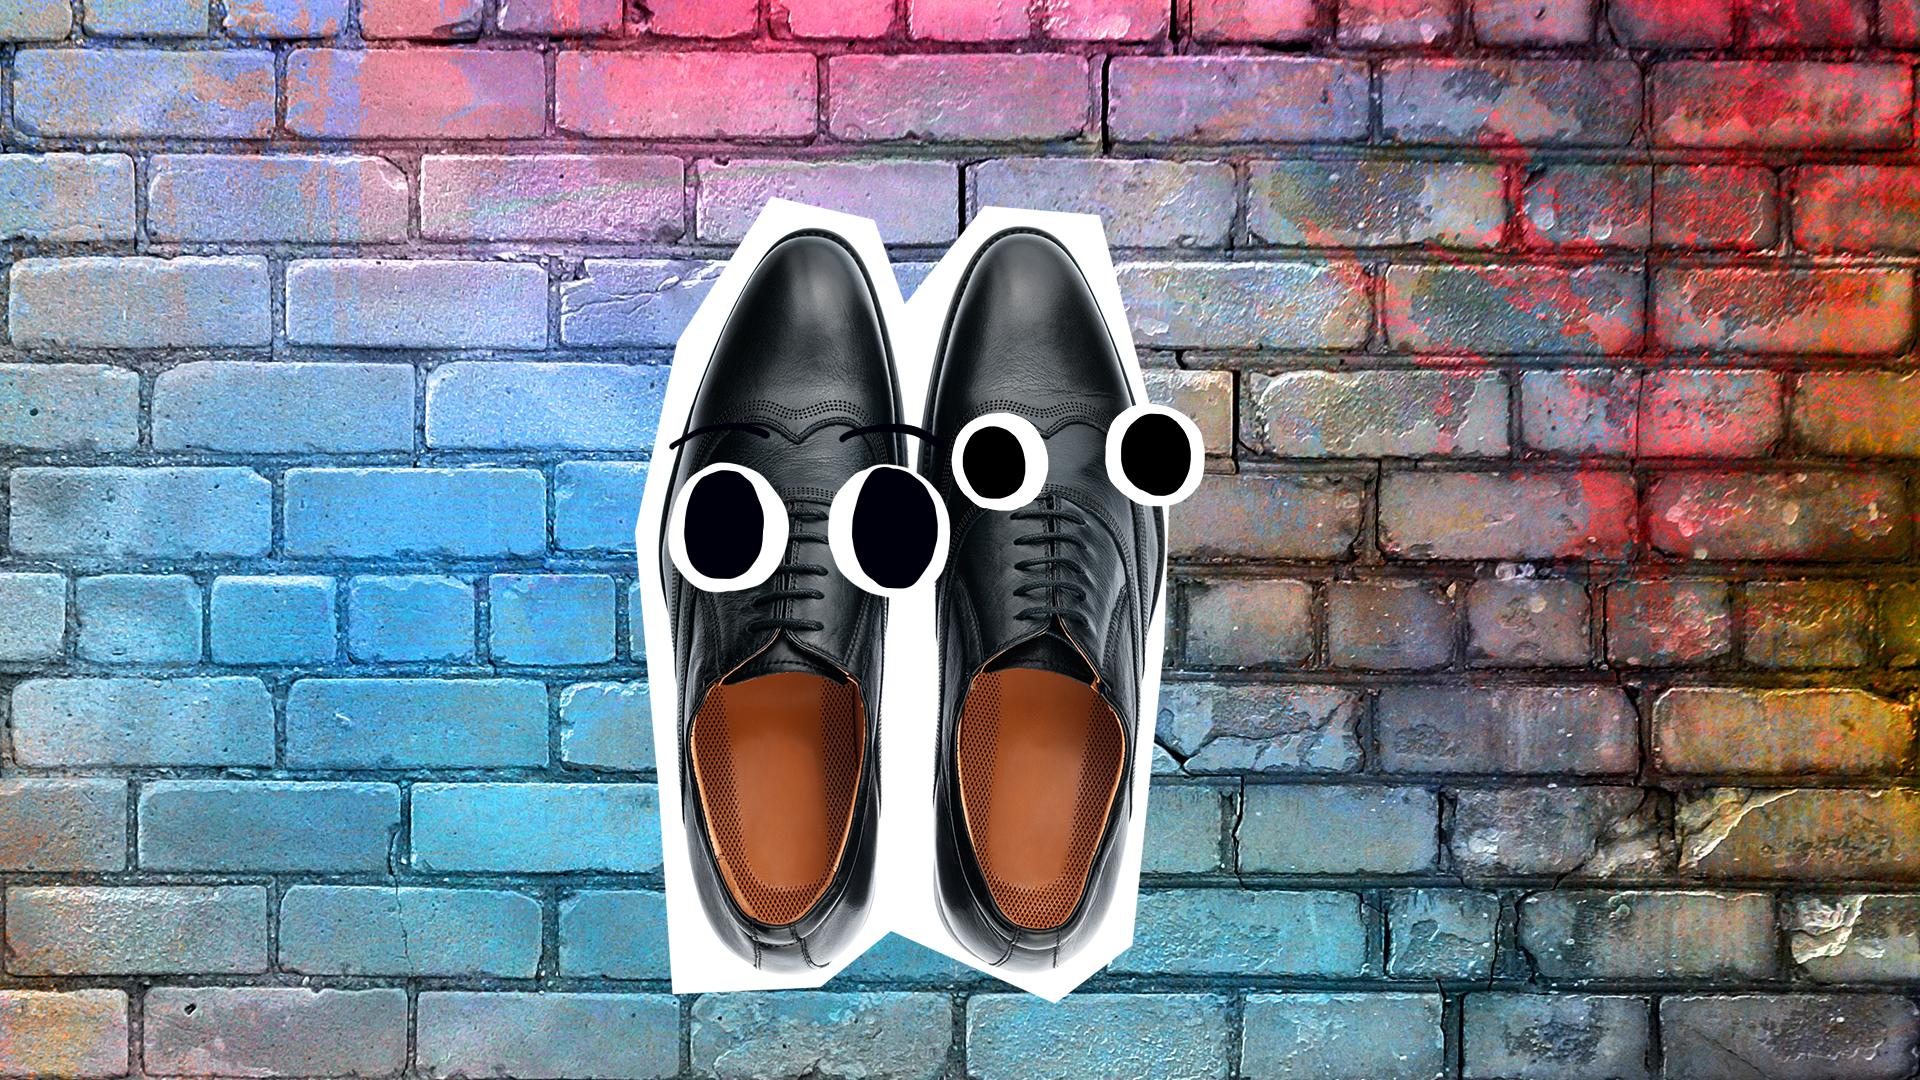 Black shoes on a pavement